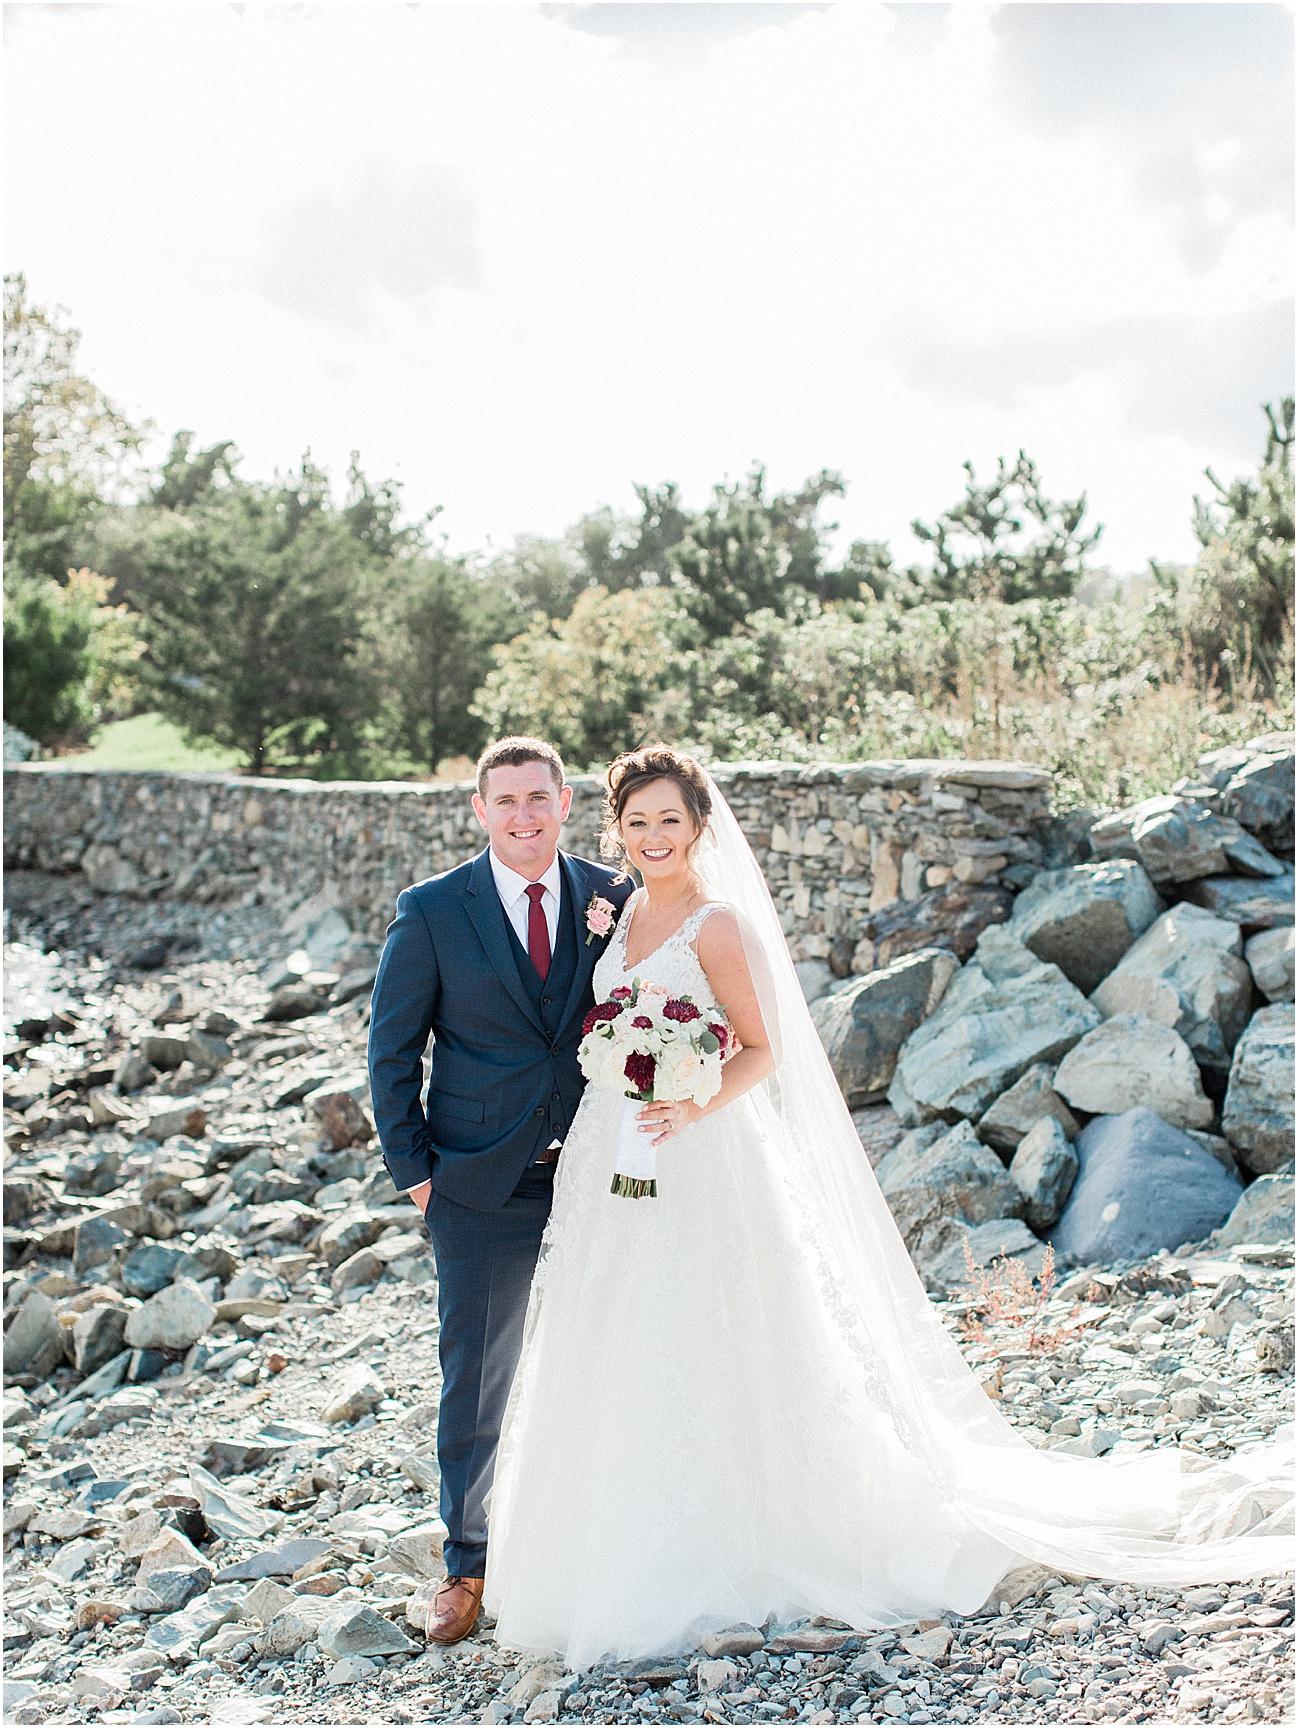 shannon_daniel_dan_atlantic_resort_saint_marys_st_mary_church_fall_newport_catholic_irish_cape_cod_boston_wedding_photographer_meredith_jane_photography_photo_1622.jpg